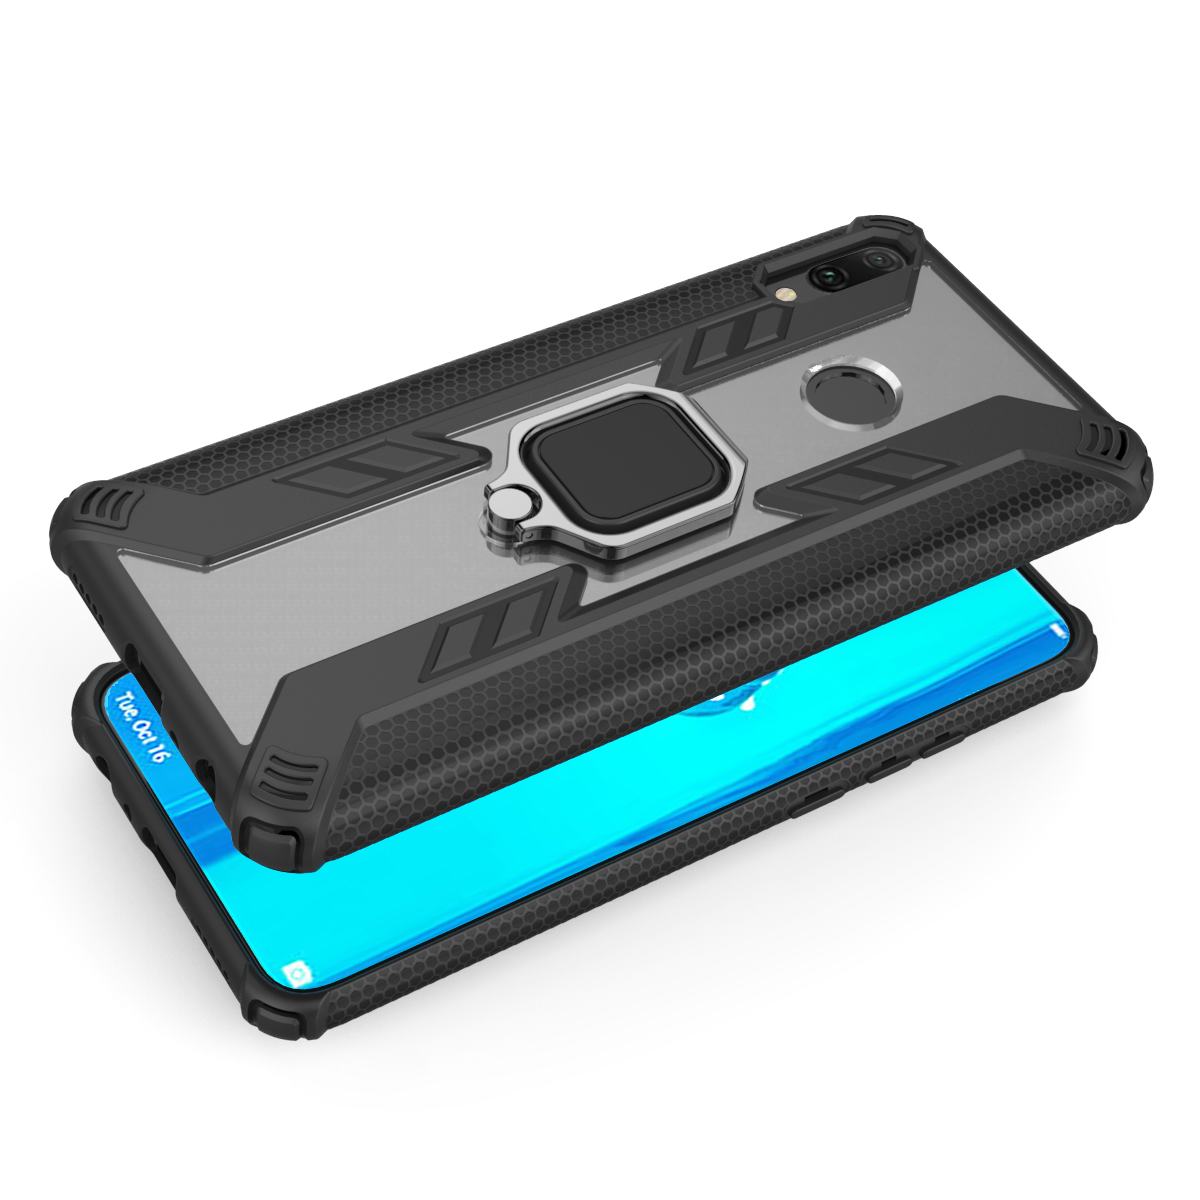 Для Huawei Smart Pro Y9 Y6 Prime P Smart (2019) Honor 20 10 Lite 10i 20i V20 роскошный противоударный чехол-подставка для пальца